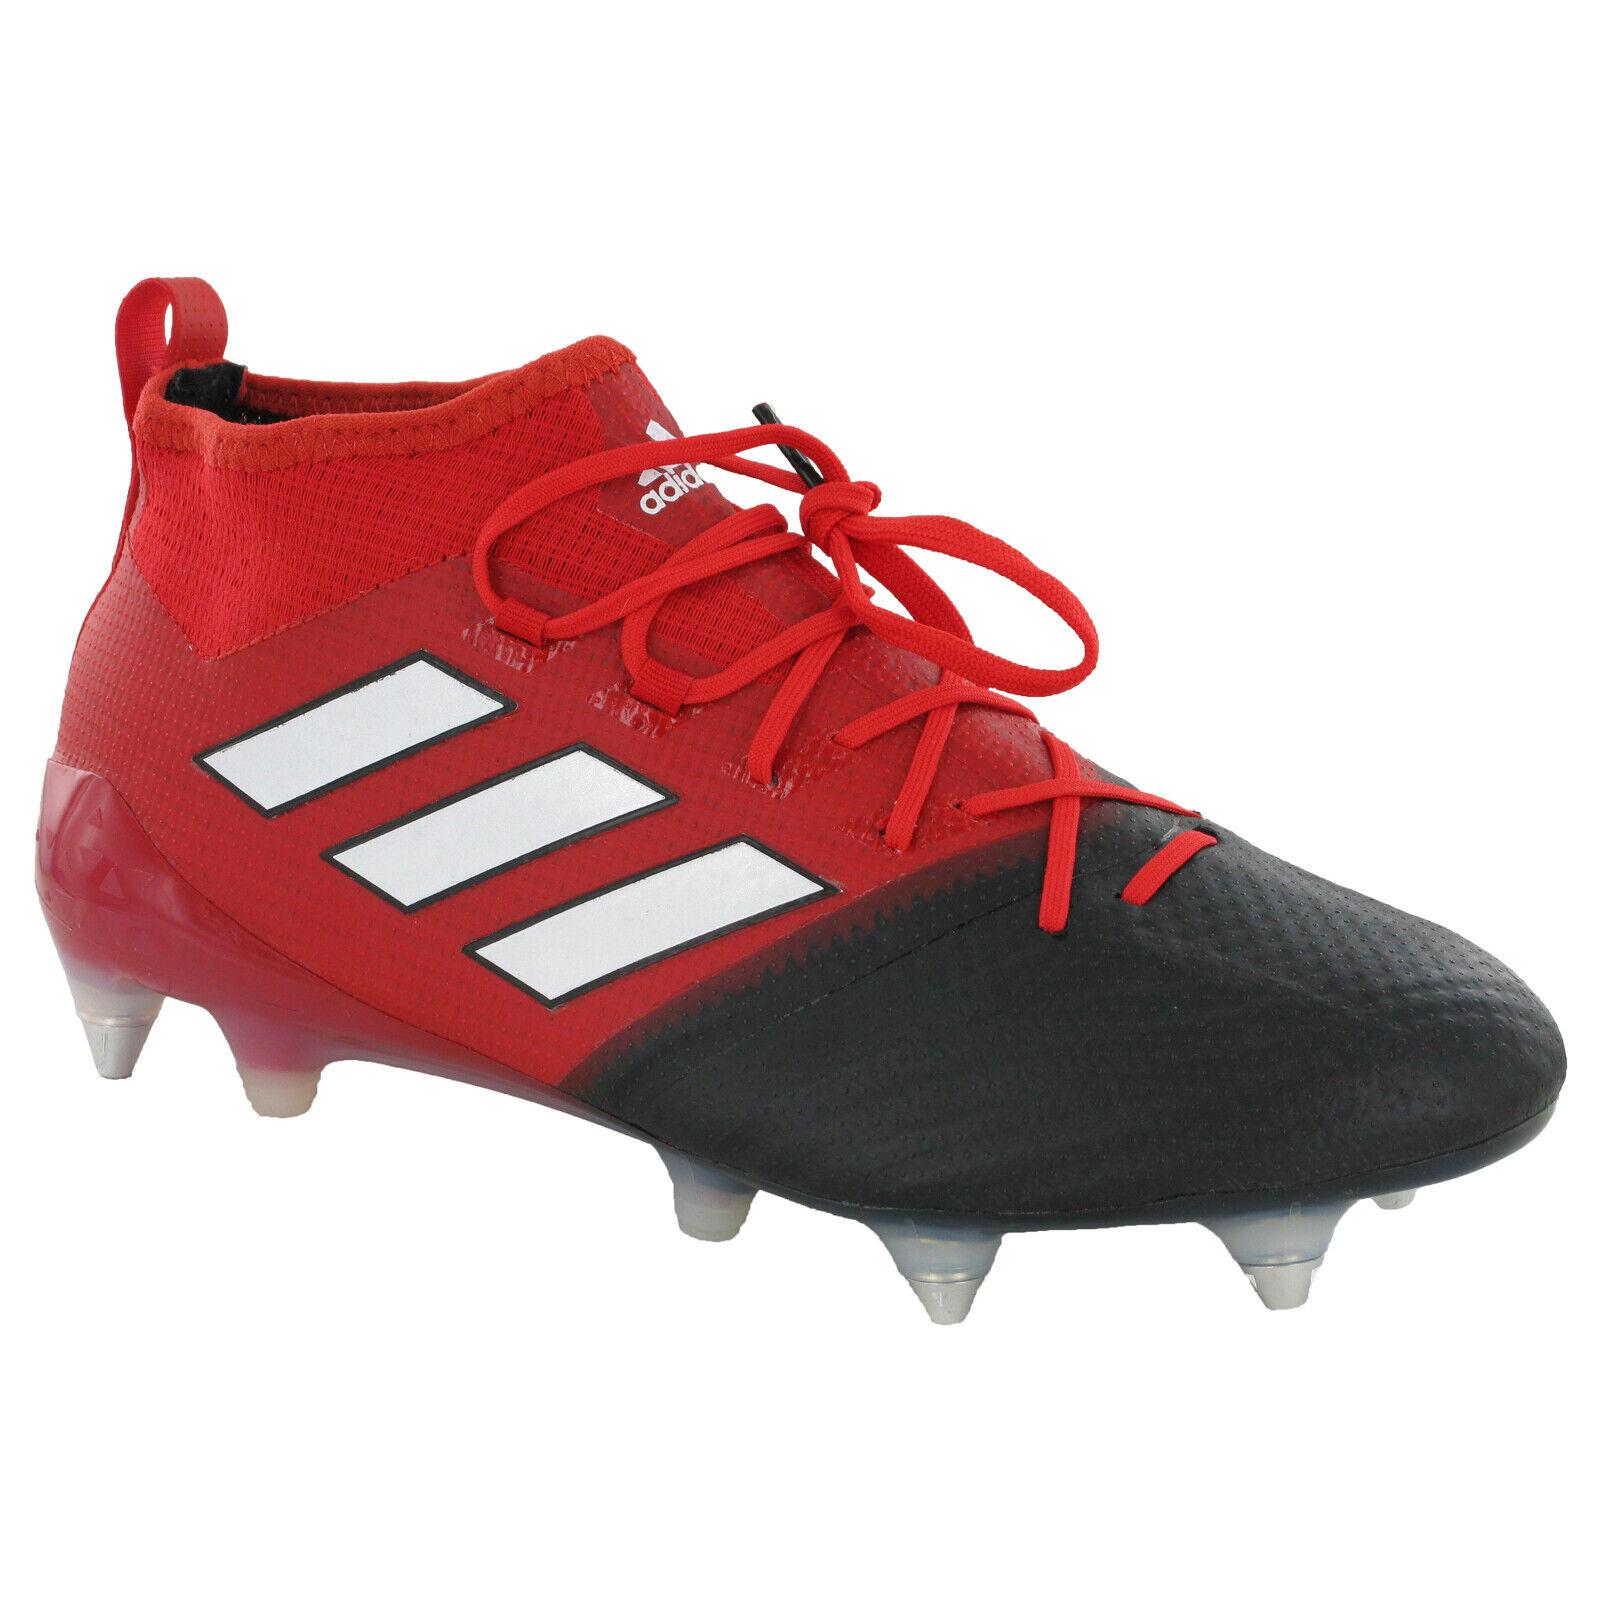 Adidas Ace 17.1 Primeknit Sautope da Calcio Uomo Studded Tacchetti BA9188